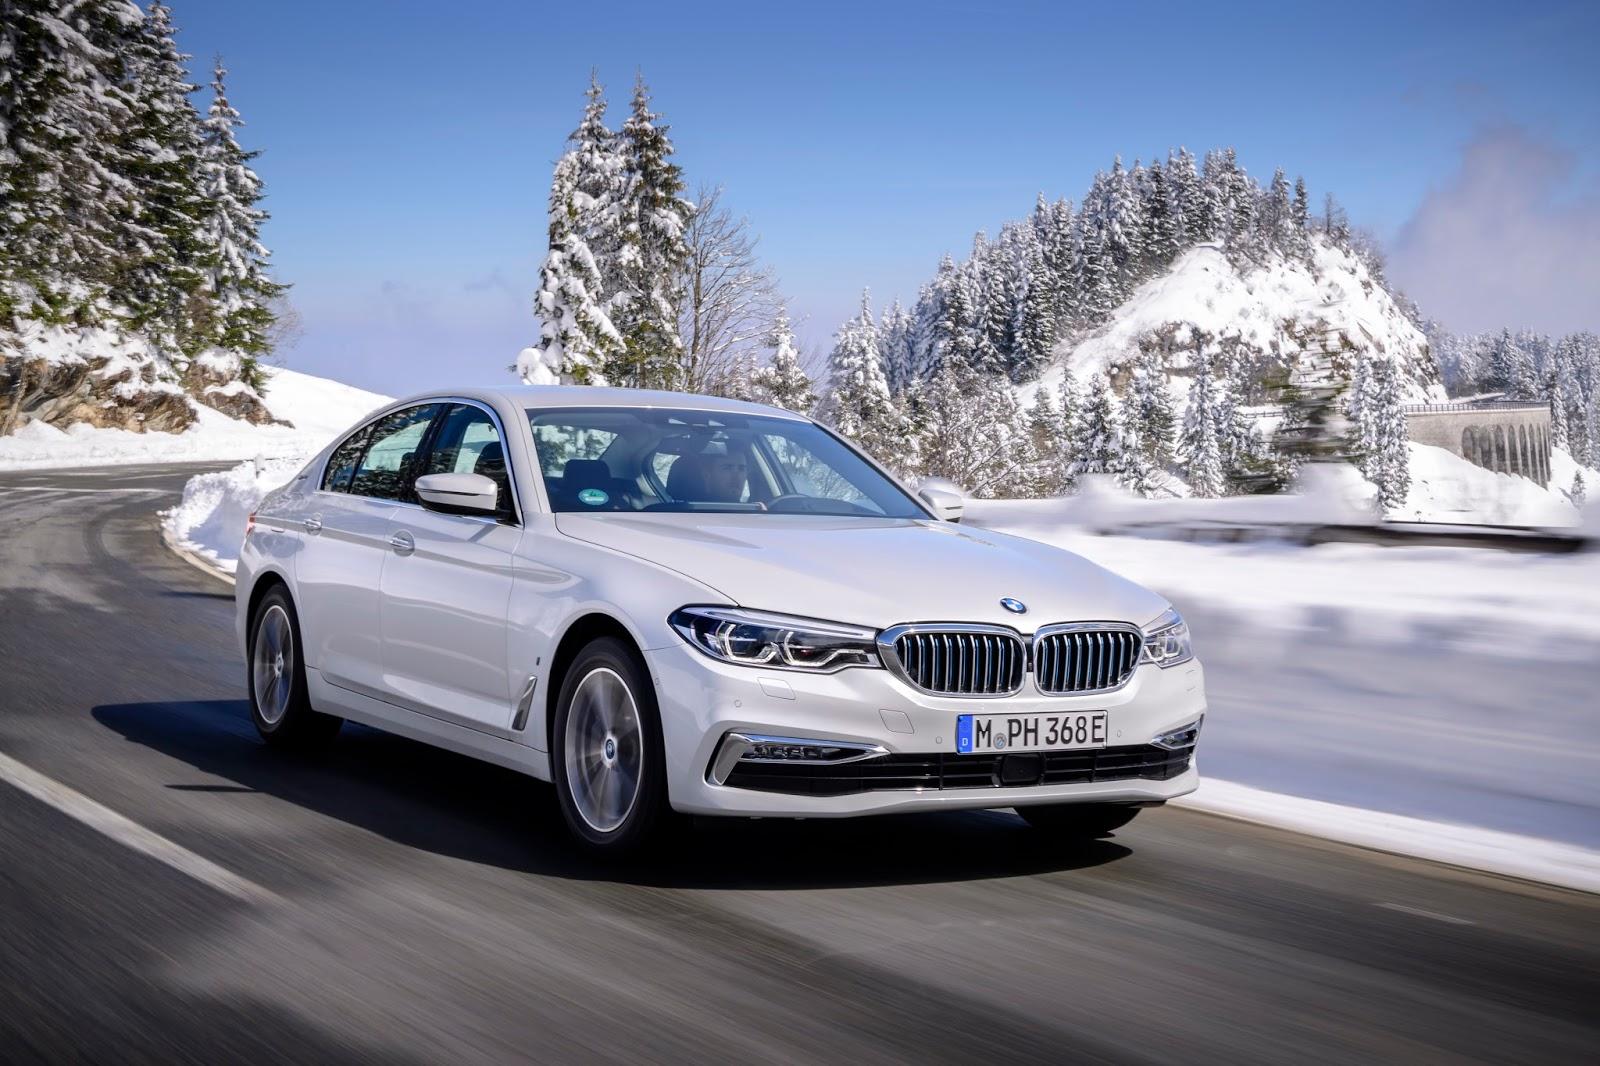 P90256328 highRes the new bmw 530e ipe Η BMW 530e iPerformance φέρνει την ηλεκτρική επανάσταση BMW, BMW 5, BMW 530e iPerformance, Electric cars, Hybrid, Λανσάρισμα